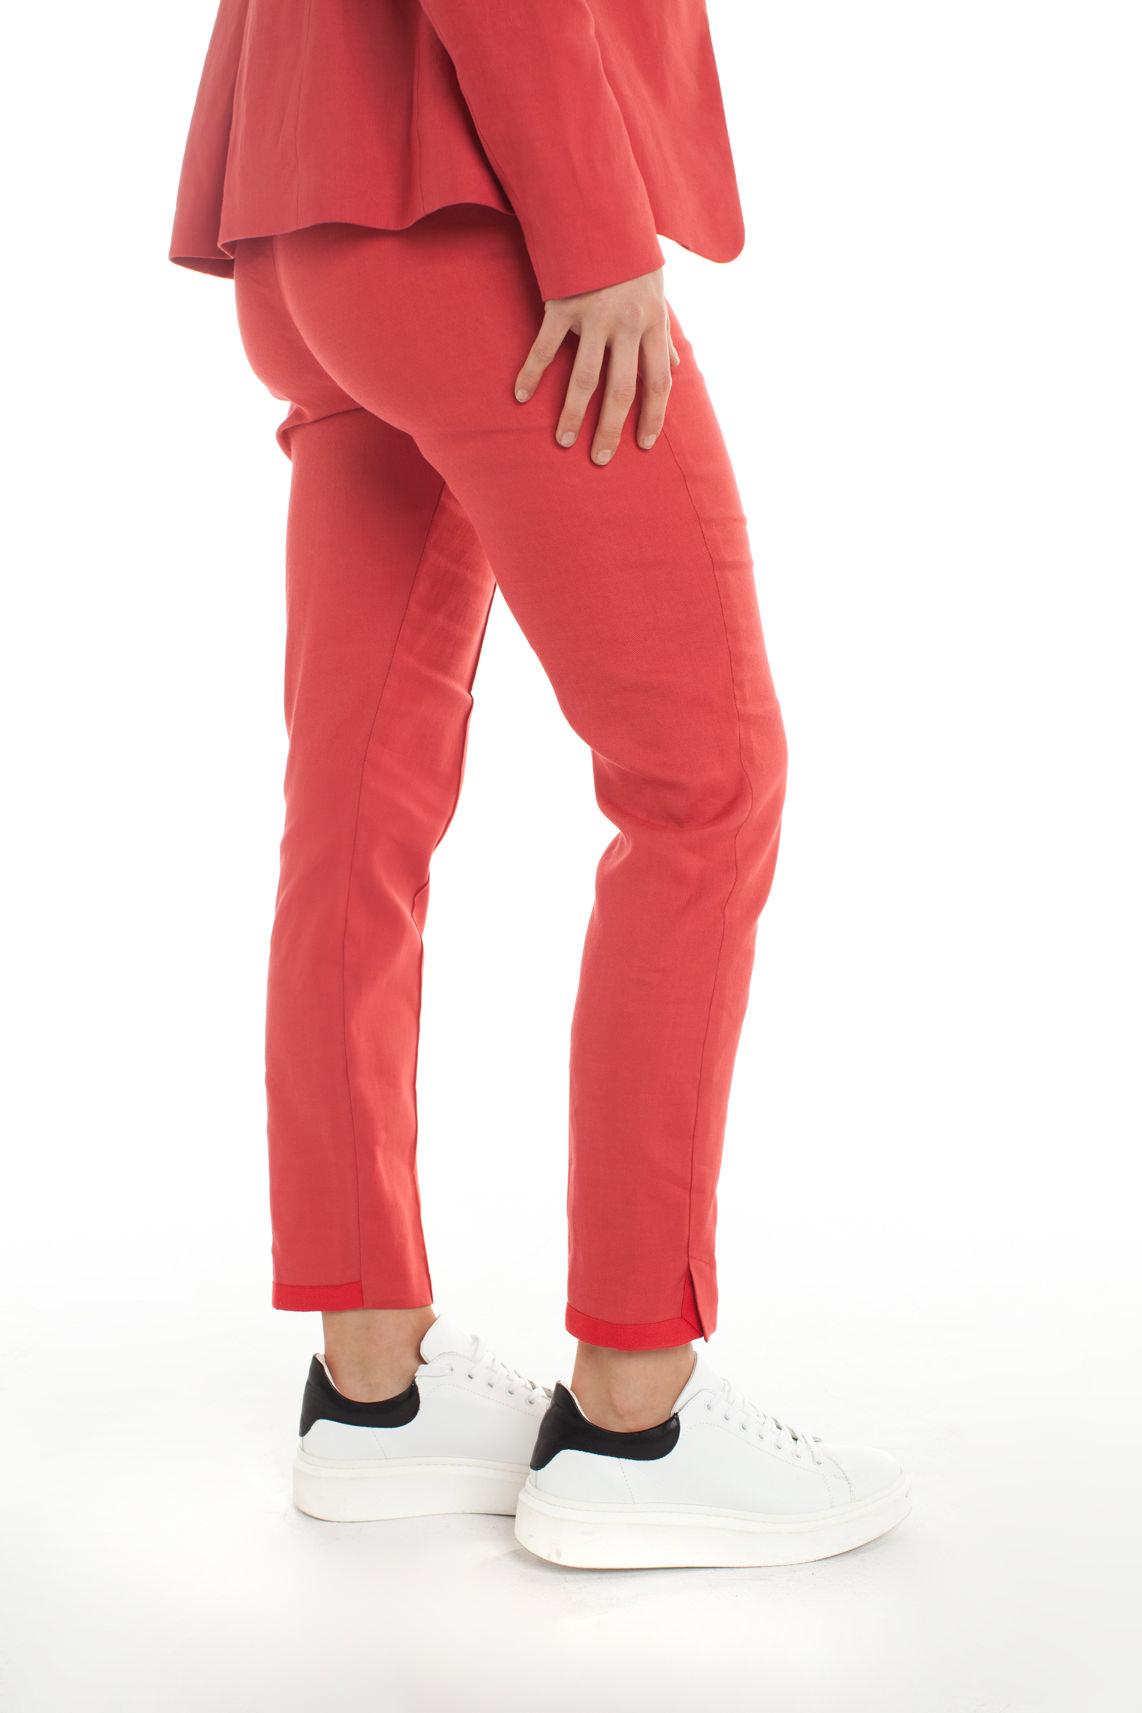 Anna Dames Linnen pantalon Rood